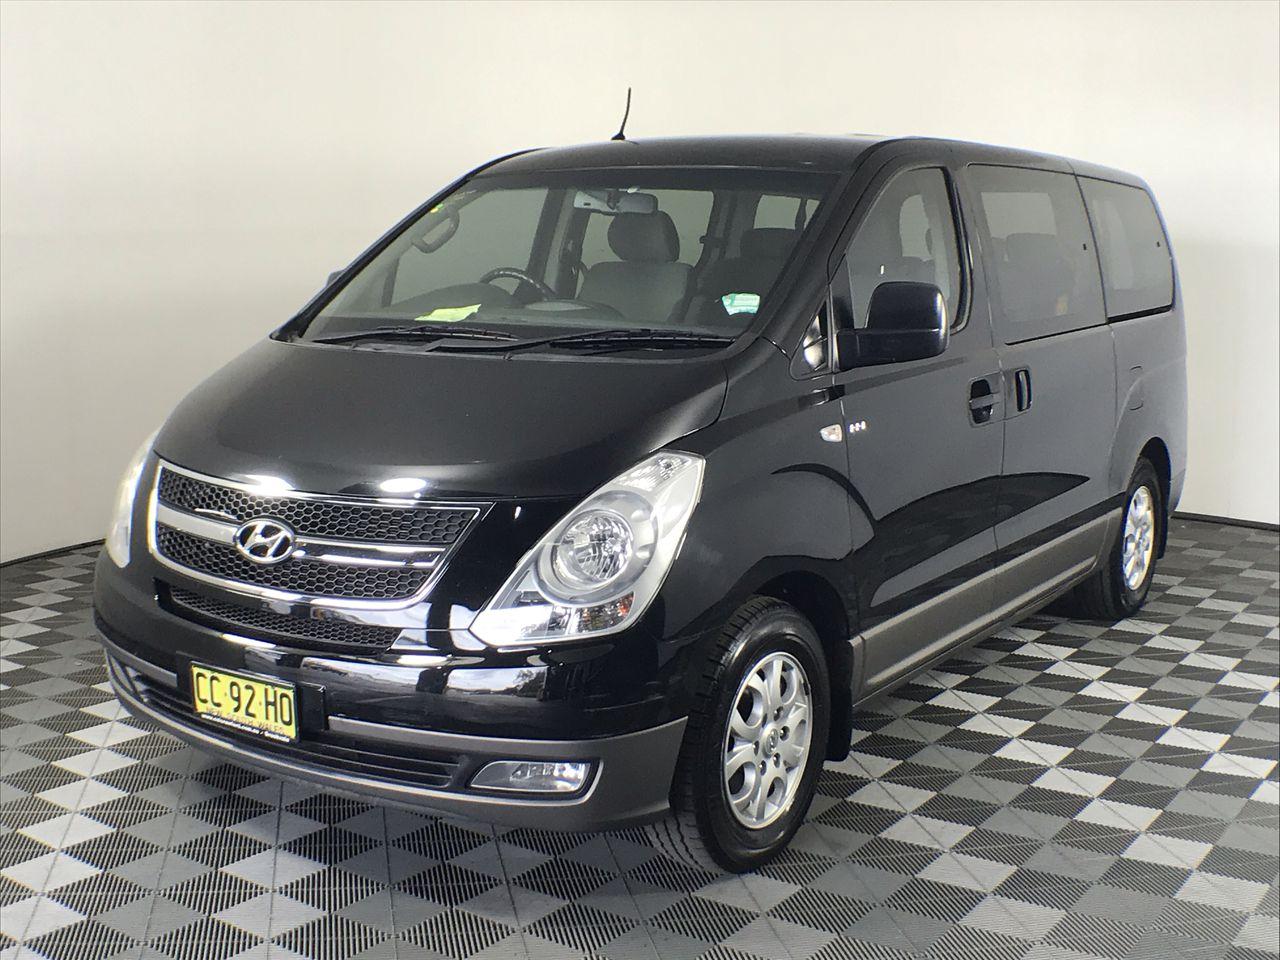 2014 Hyundai iMAX TQ Automatic 8 Seats People Mover